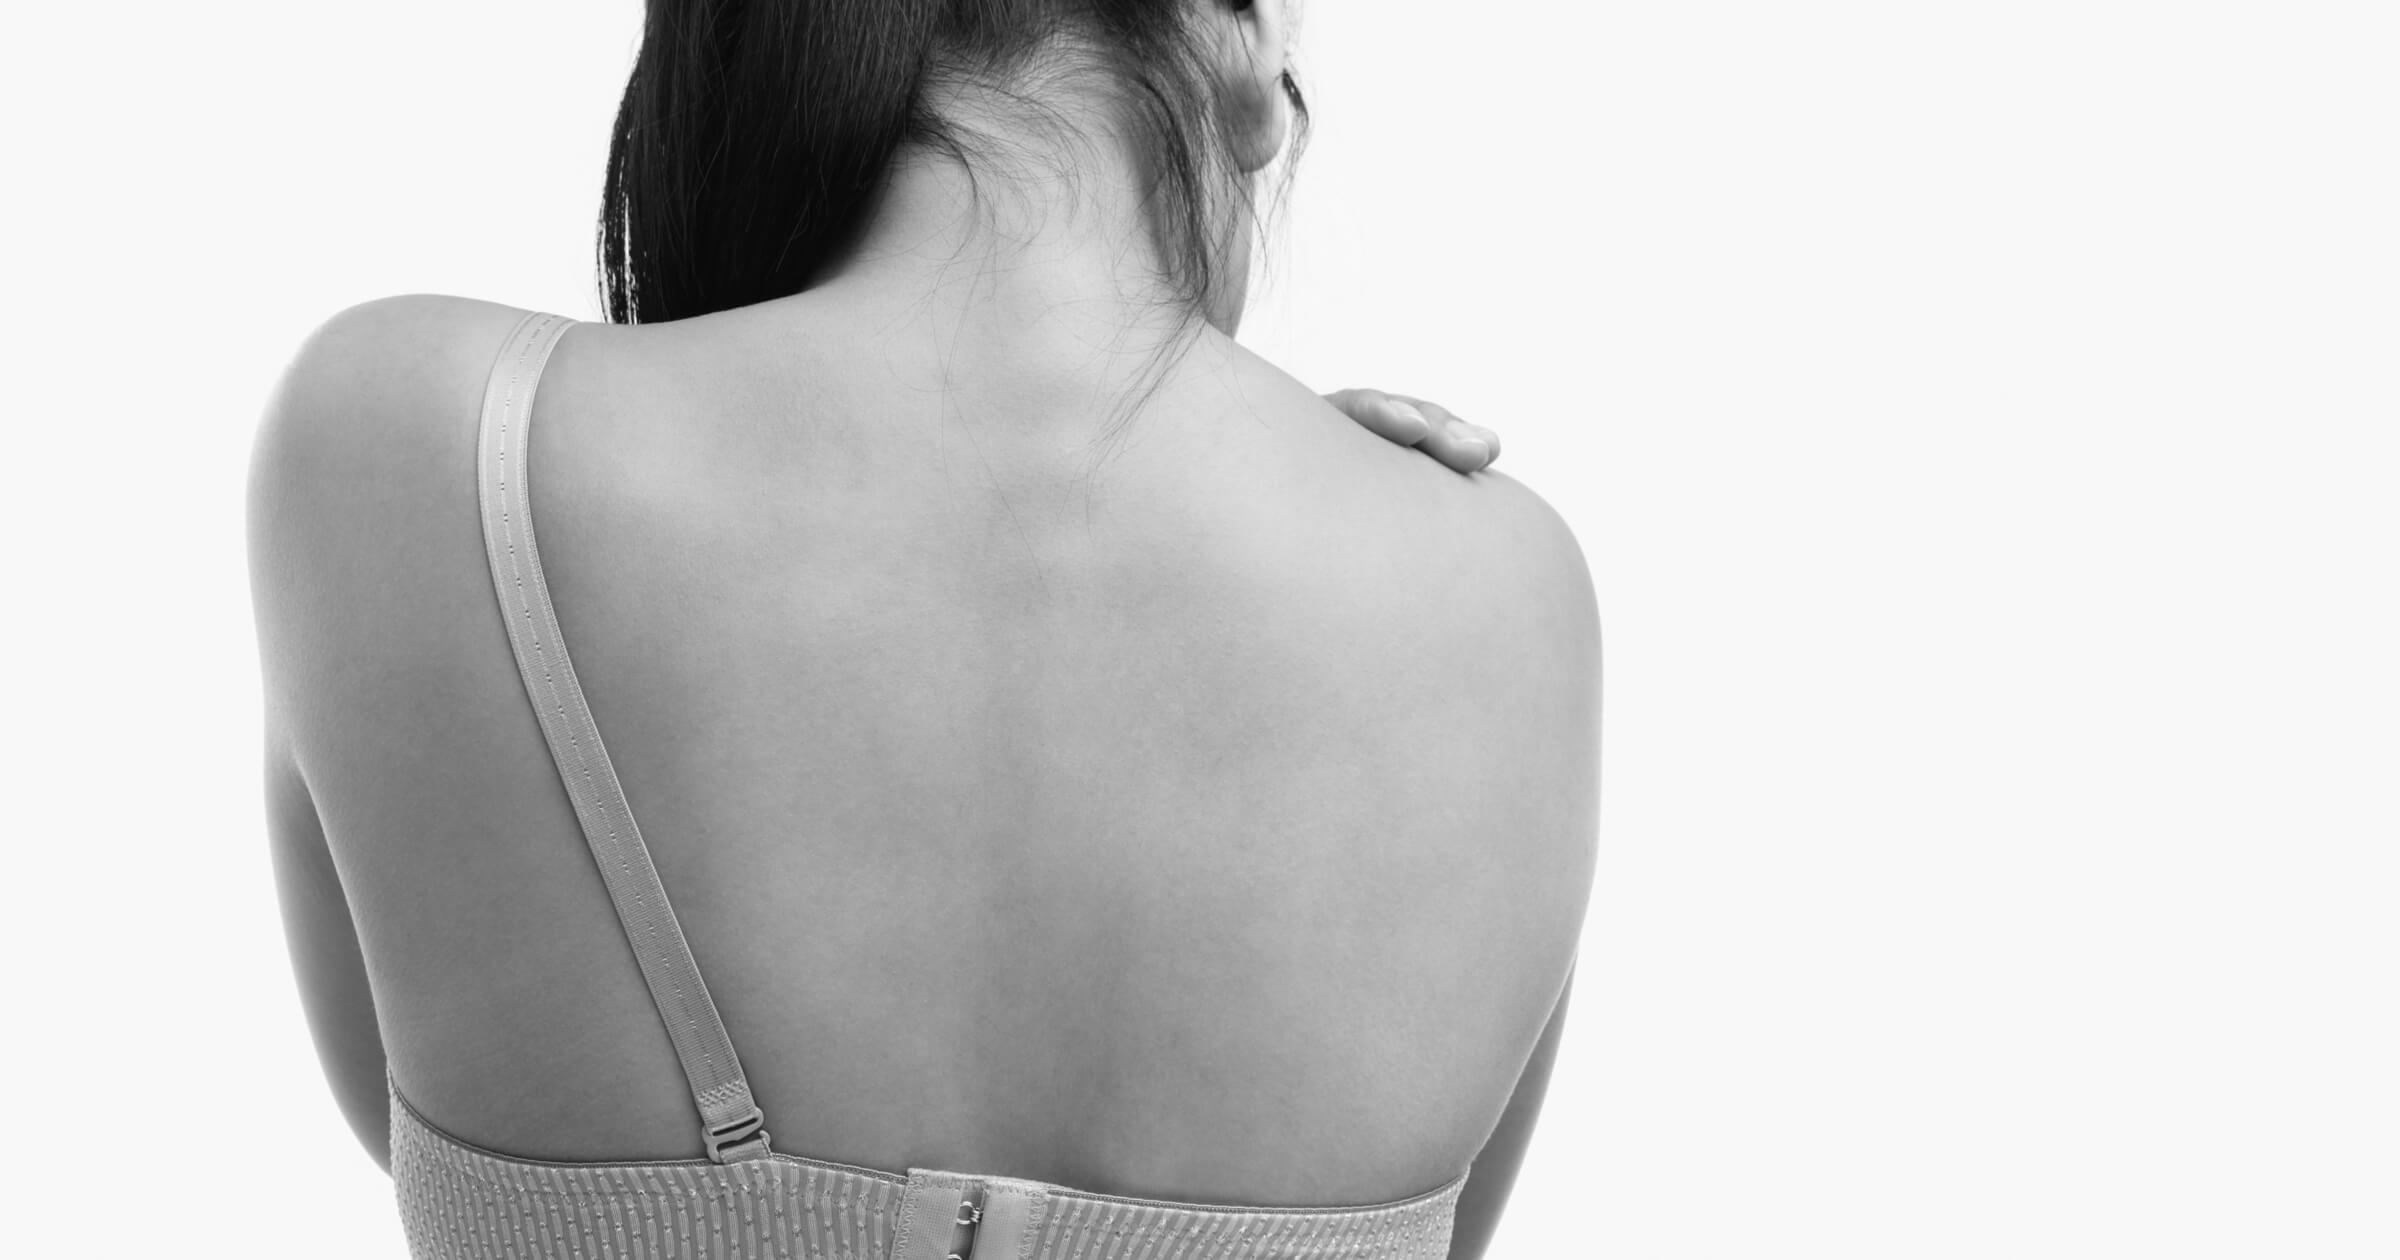 Mistet brystet etter brystimplantat